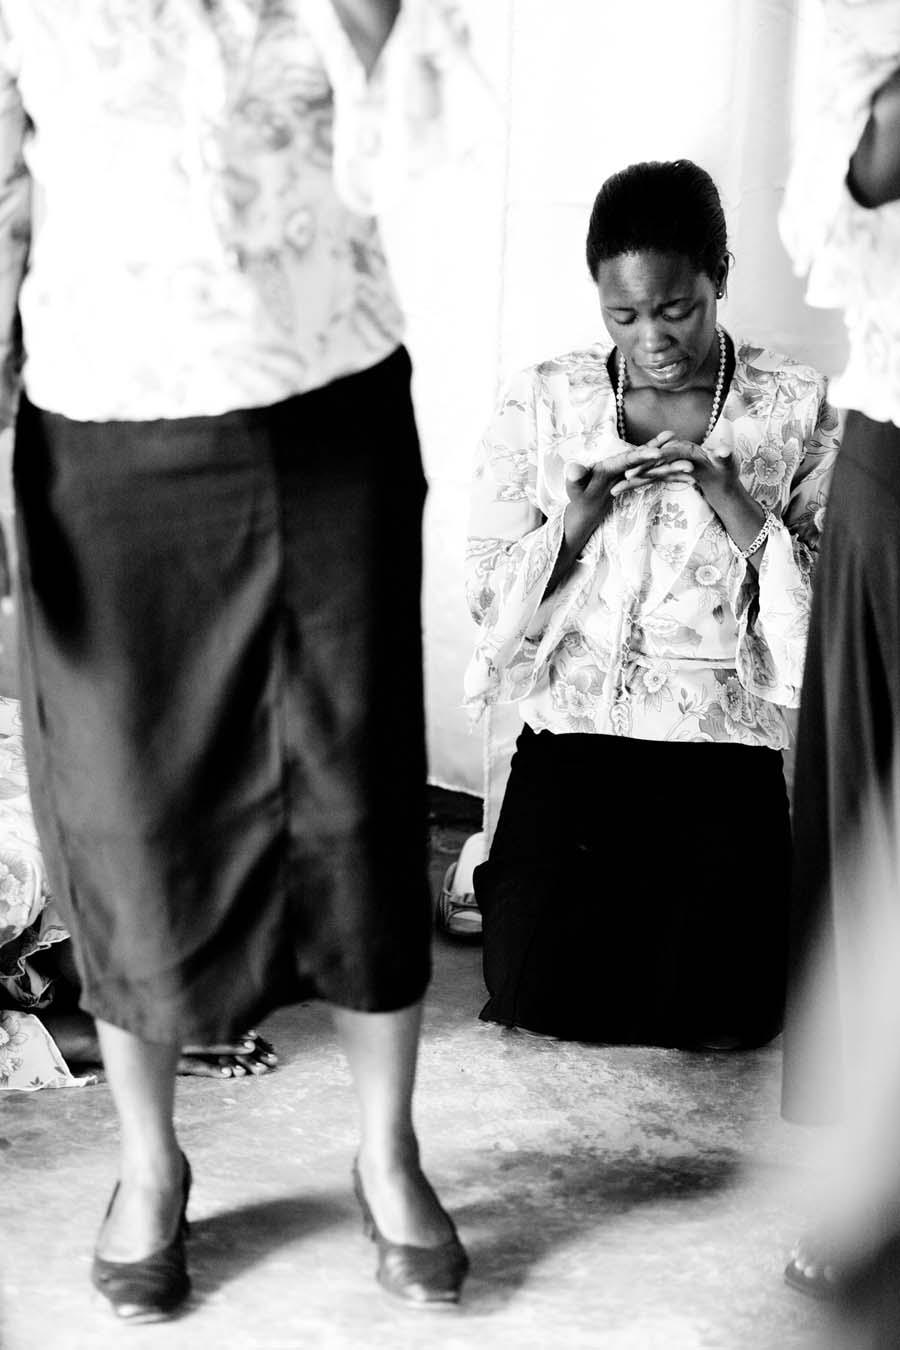 jessicadavisphotography.com | Jessica Davis Photography | Portrait Work in Uganda| Travel Photographer | World Event Photographs 8 (11).jpg